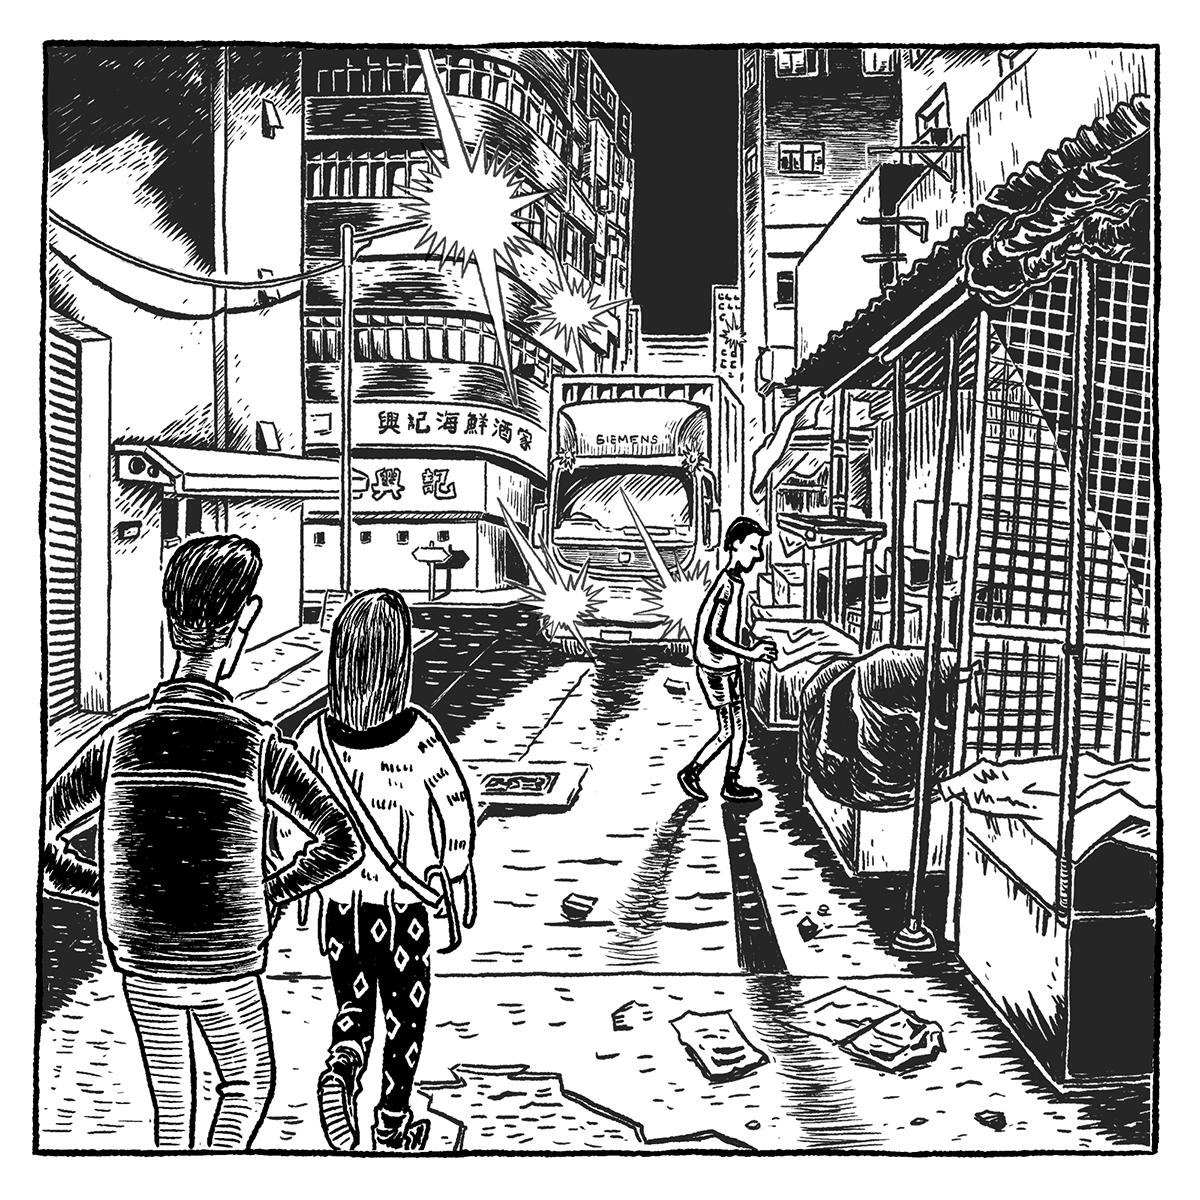 Sham Sui Po Hong Kong